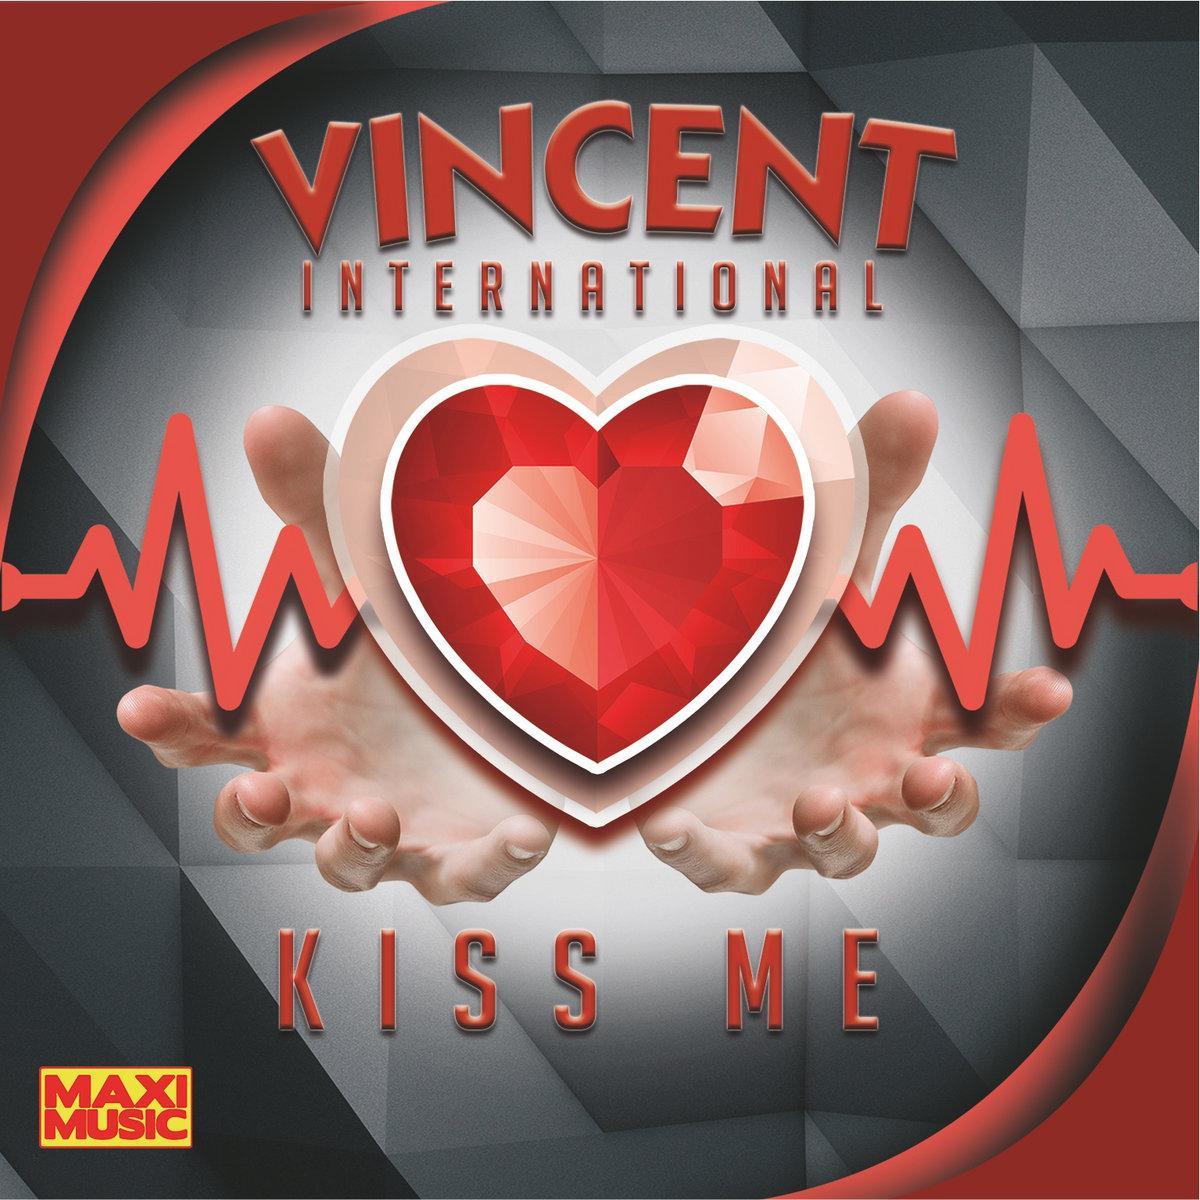 Vincent International - Kiss Me